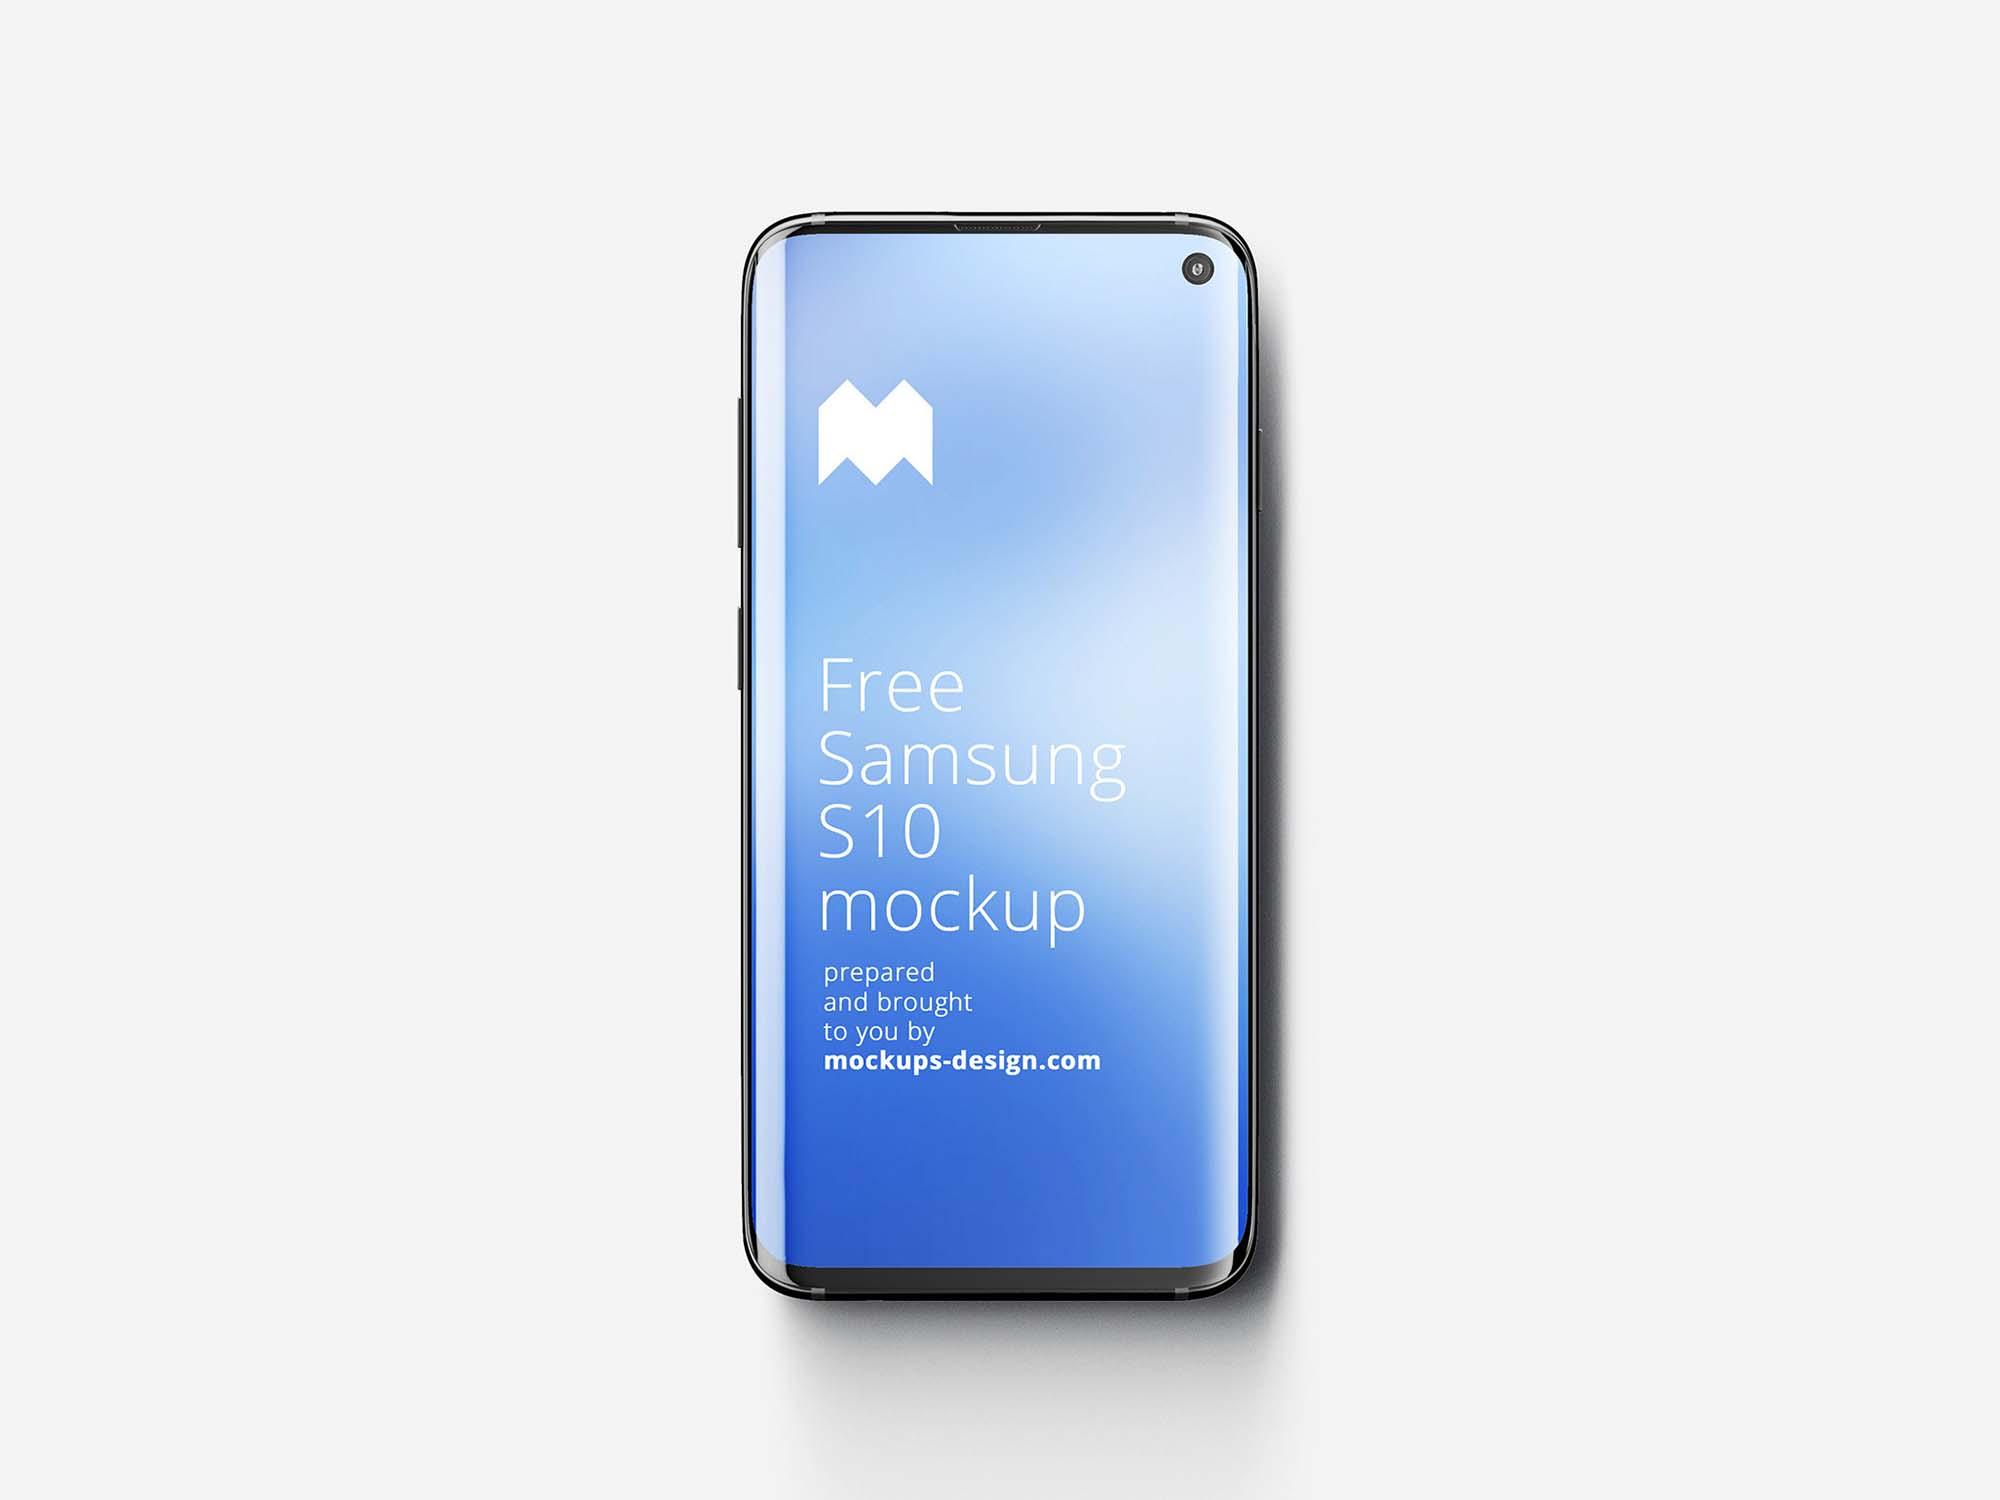 Samsung Galaxy S10 mockup 3